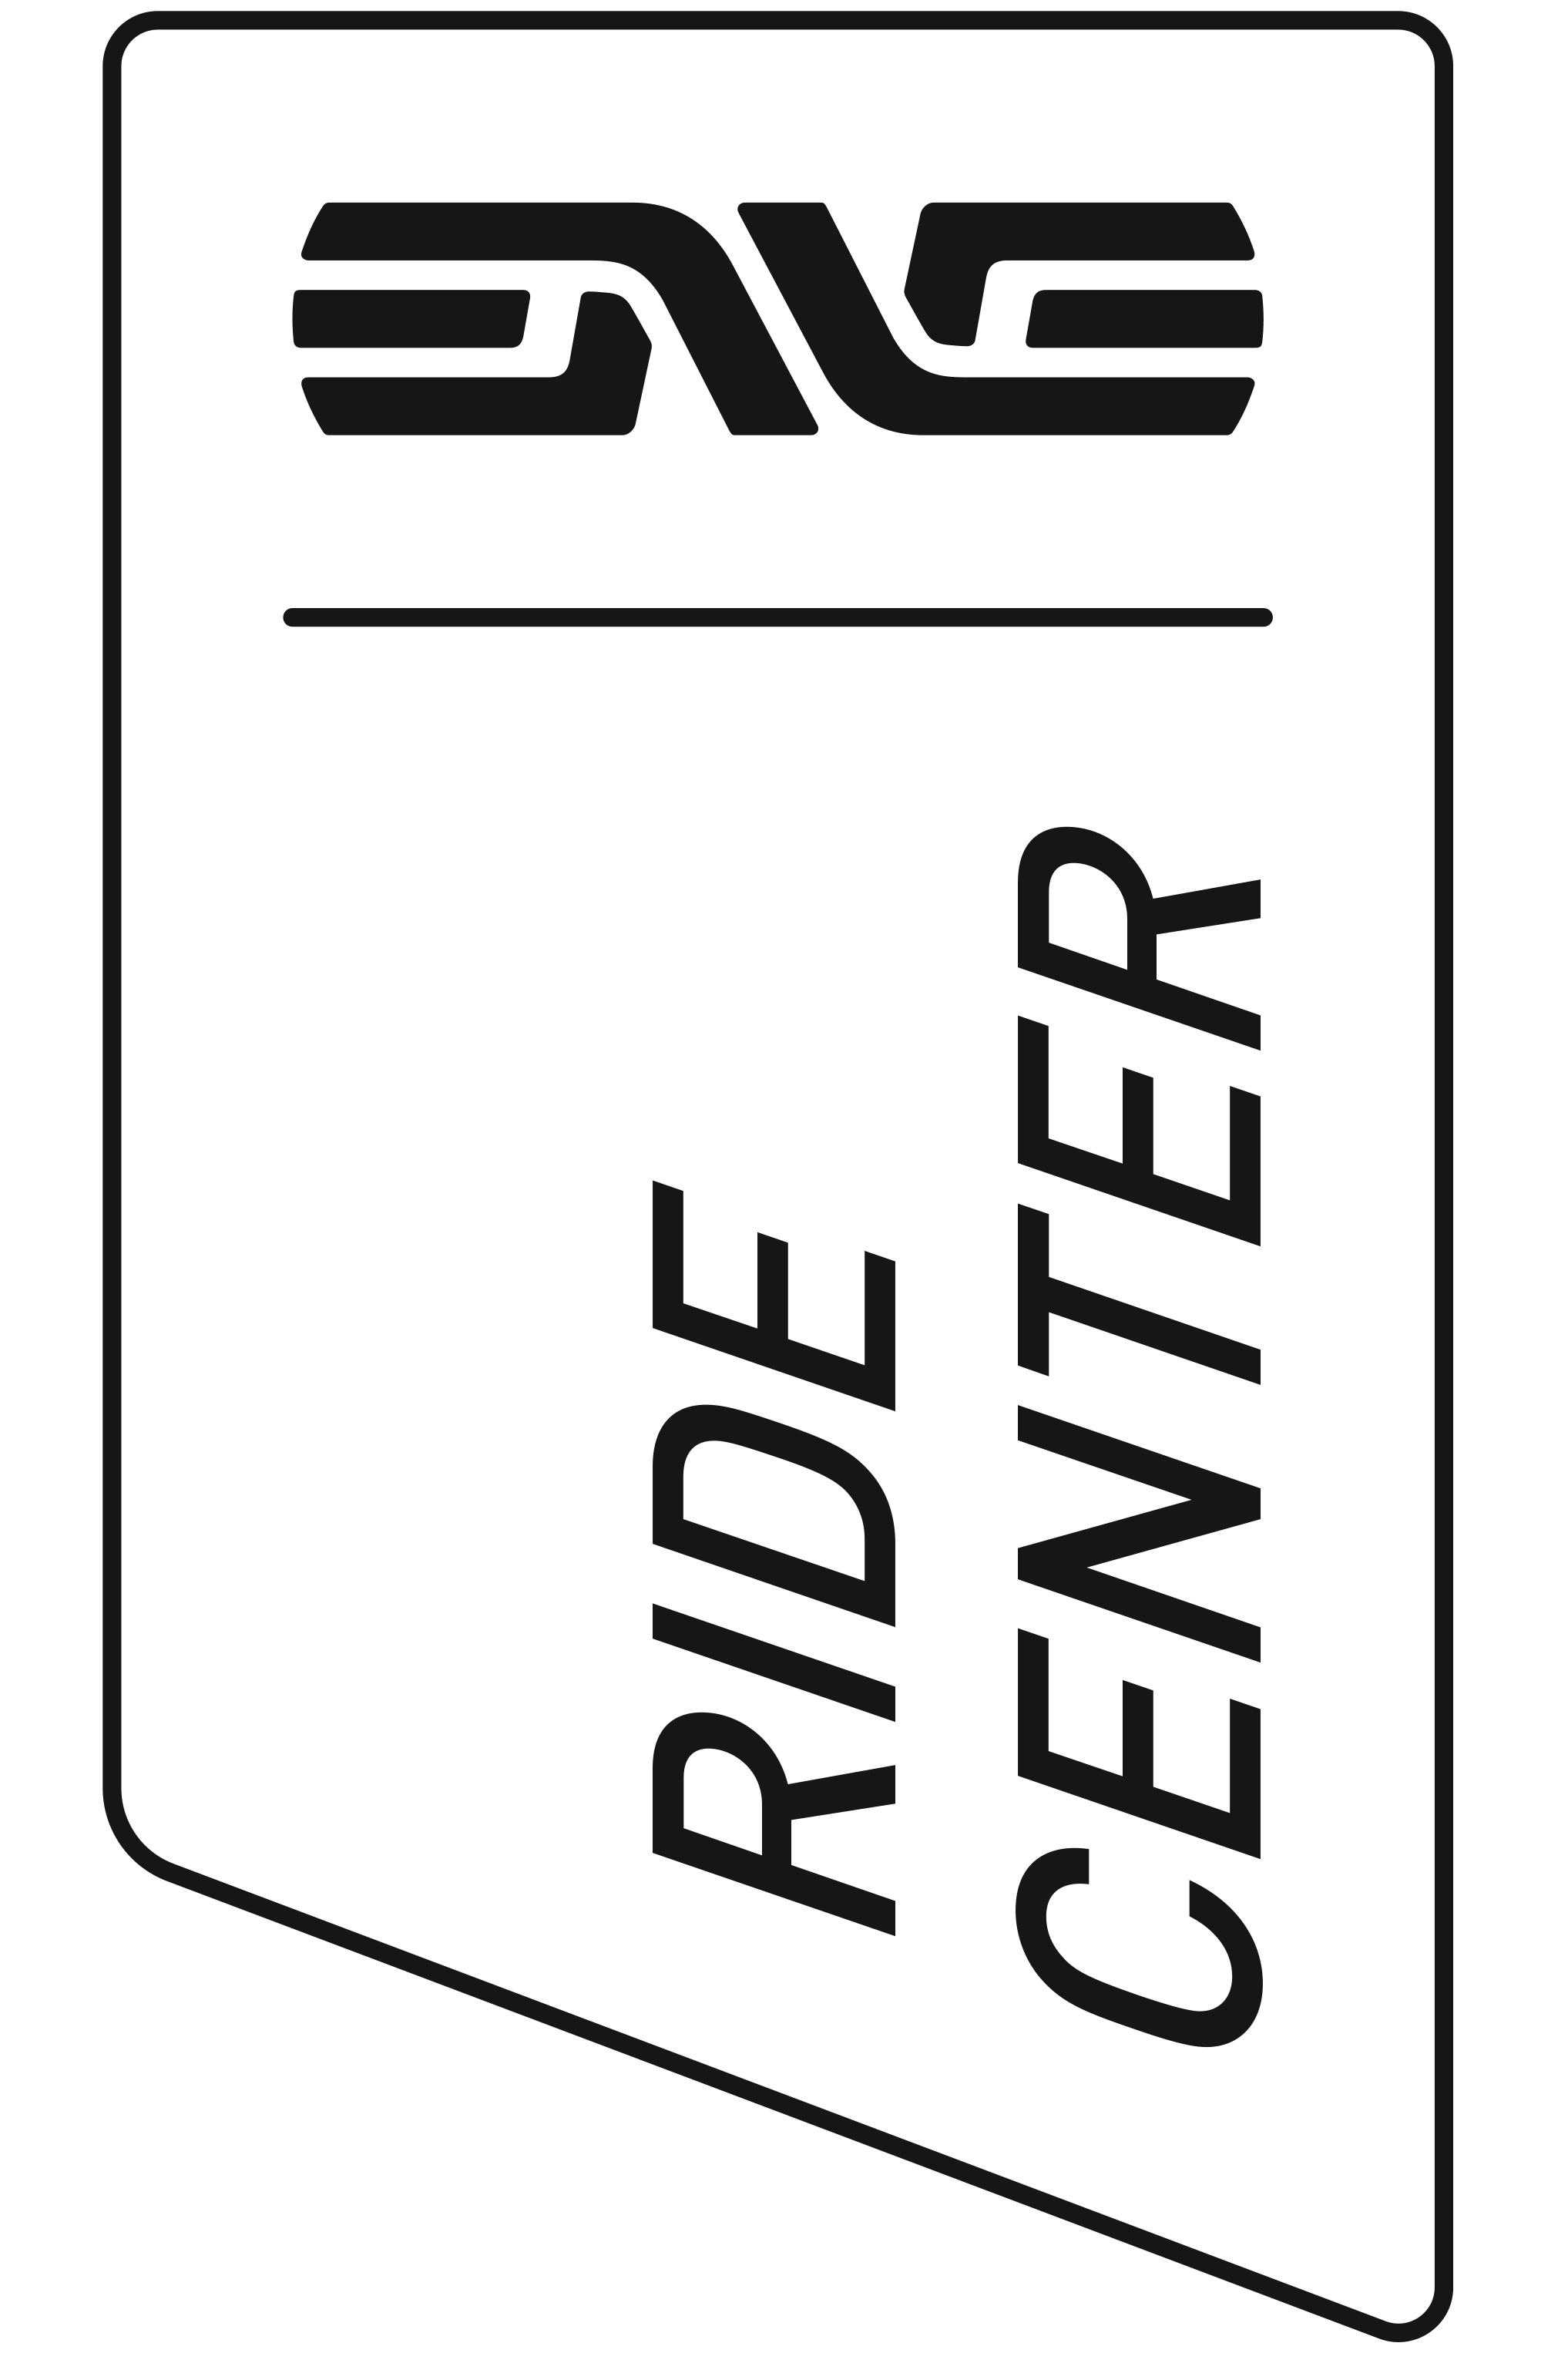 ENVE_RideCenter_Logo.jpg